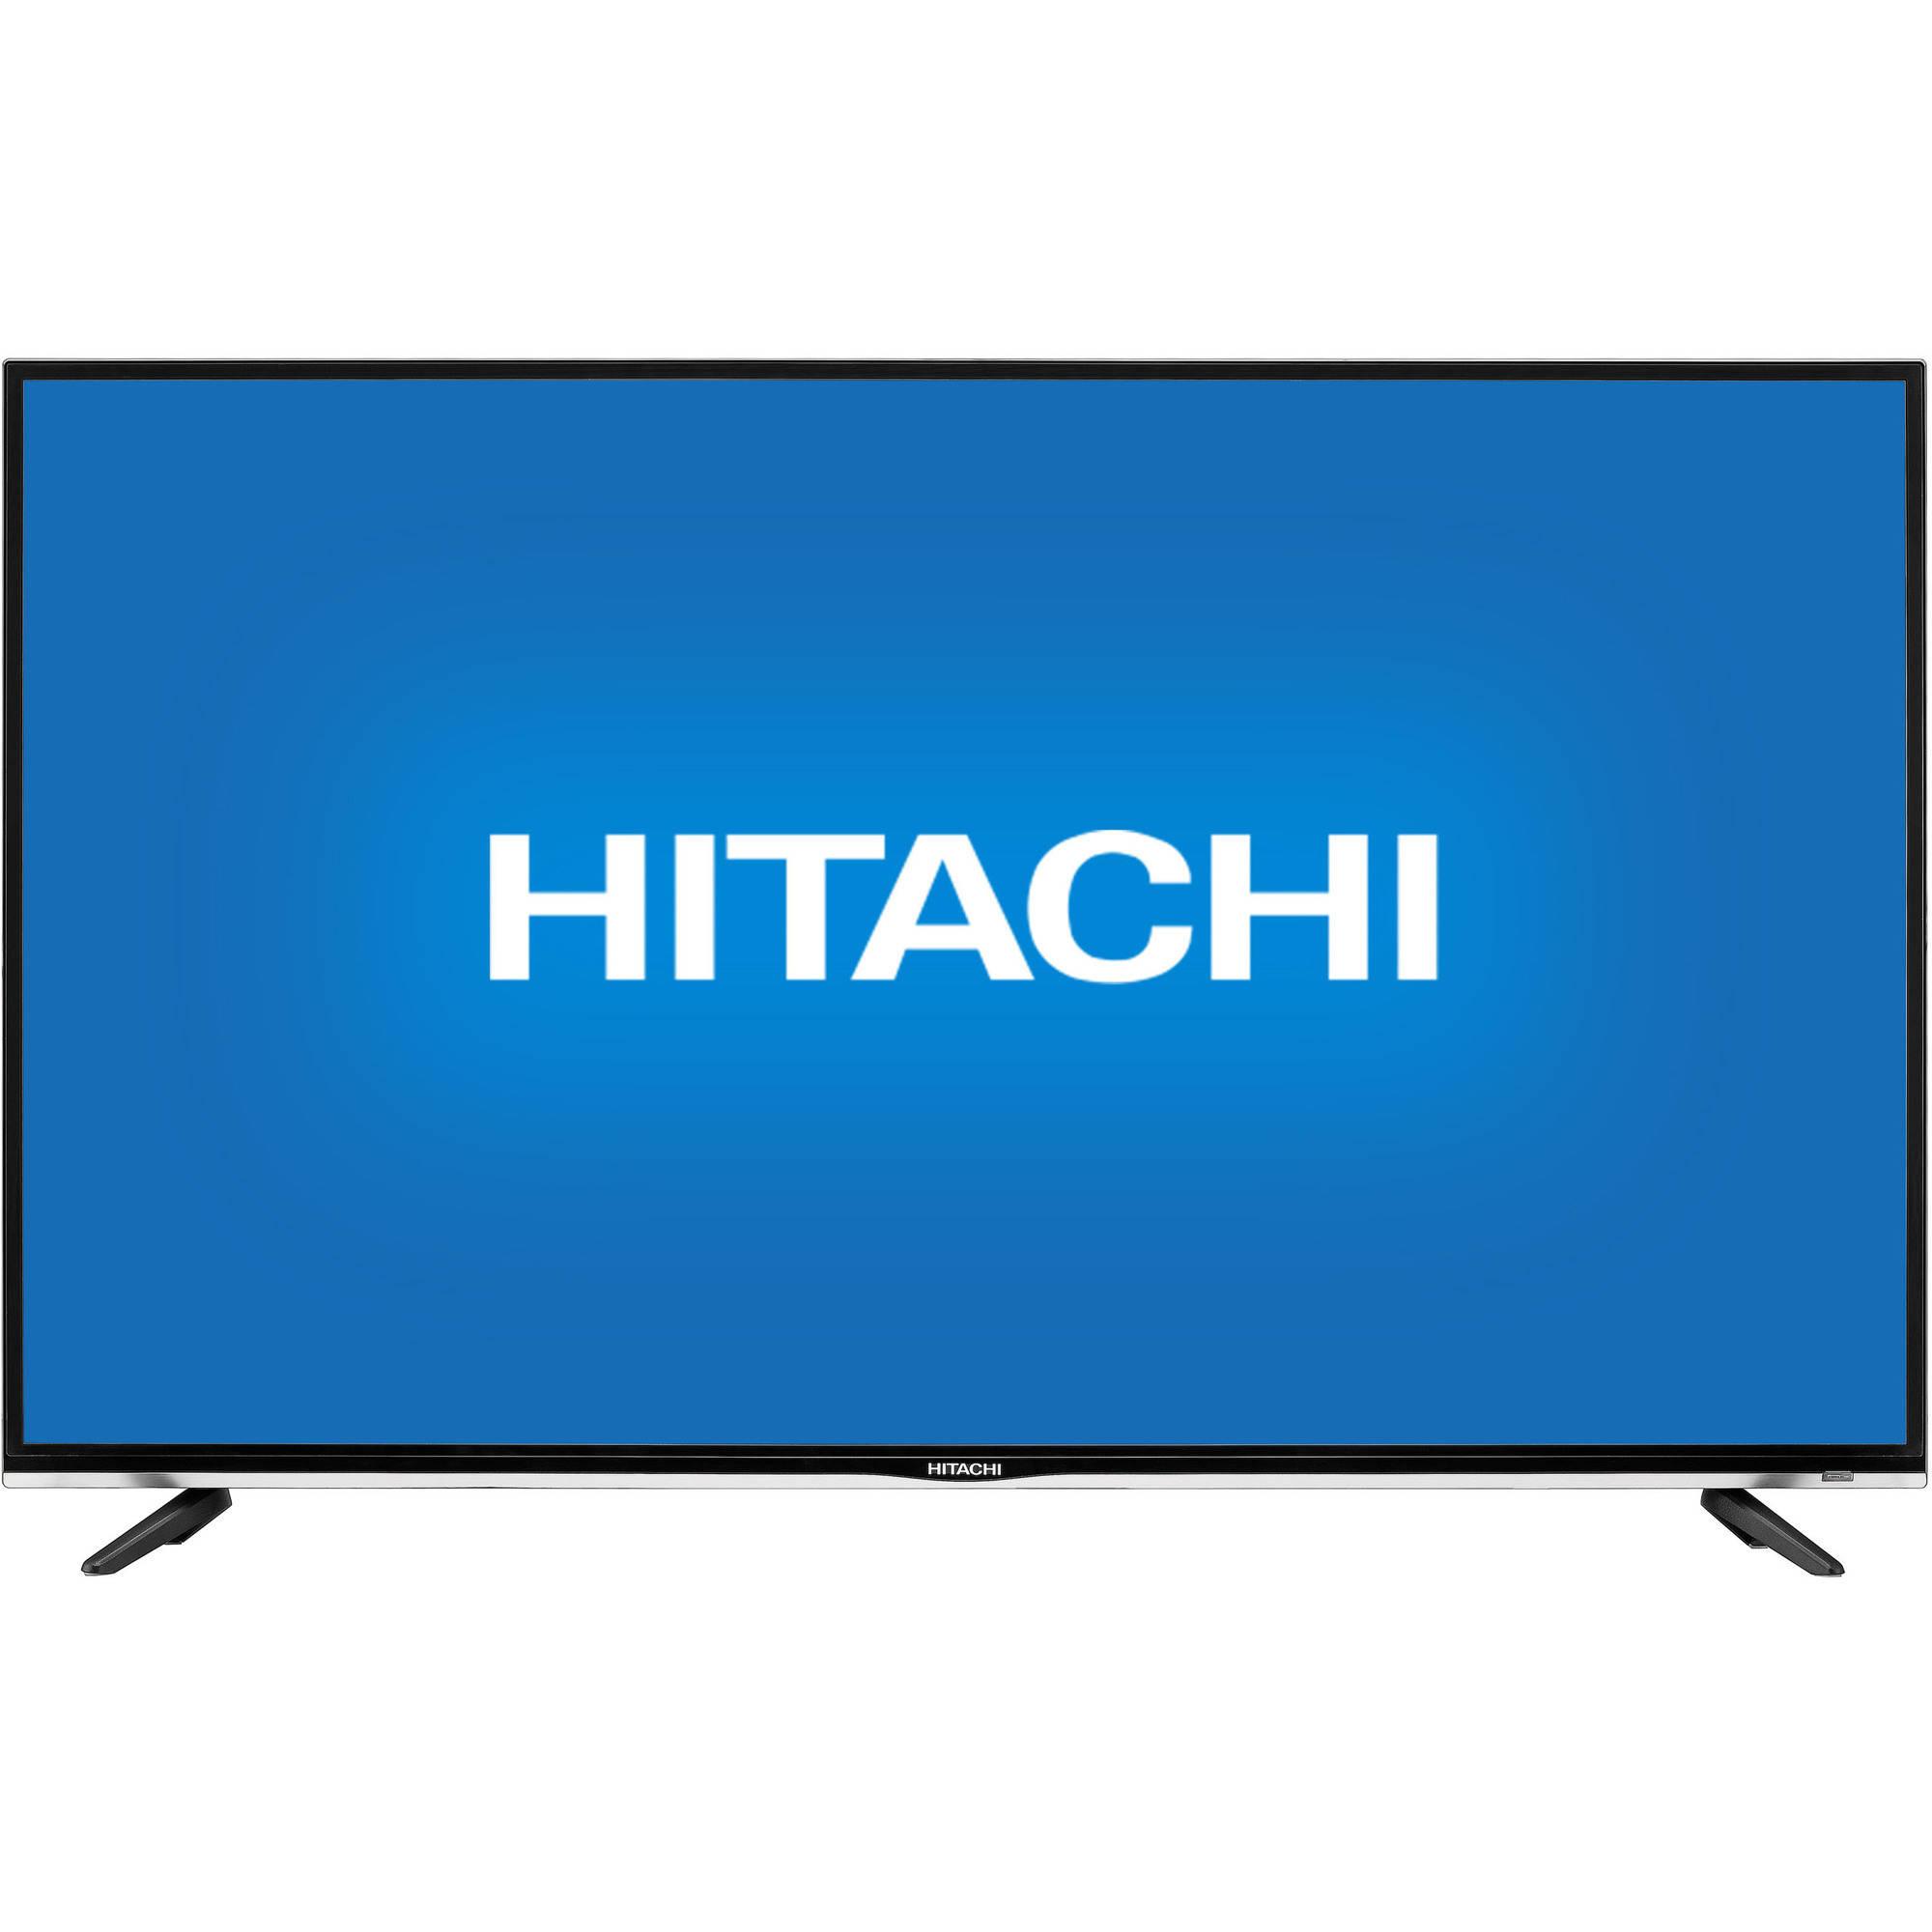 "Hitachi 50"" Class Alpha Series - Full HD, LED TV - 1080p, 60Hz (50A3)"